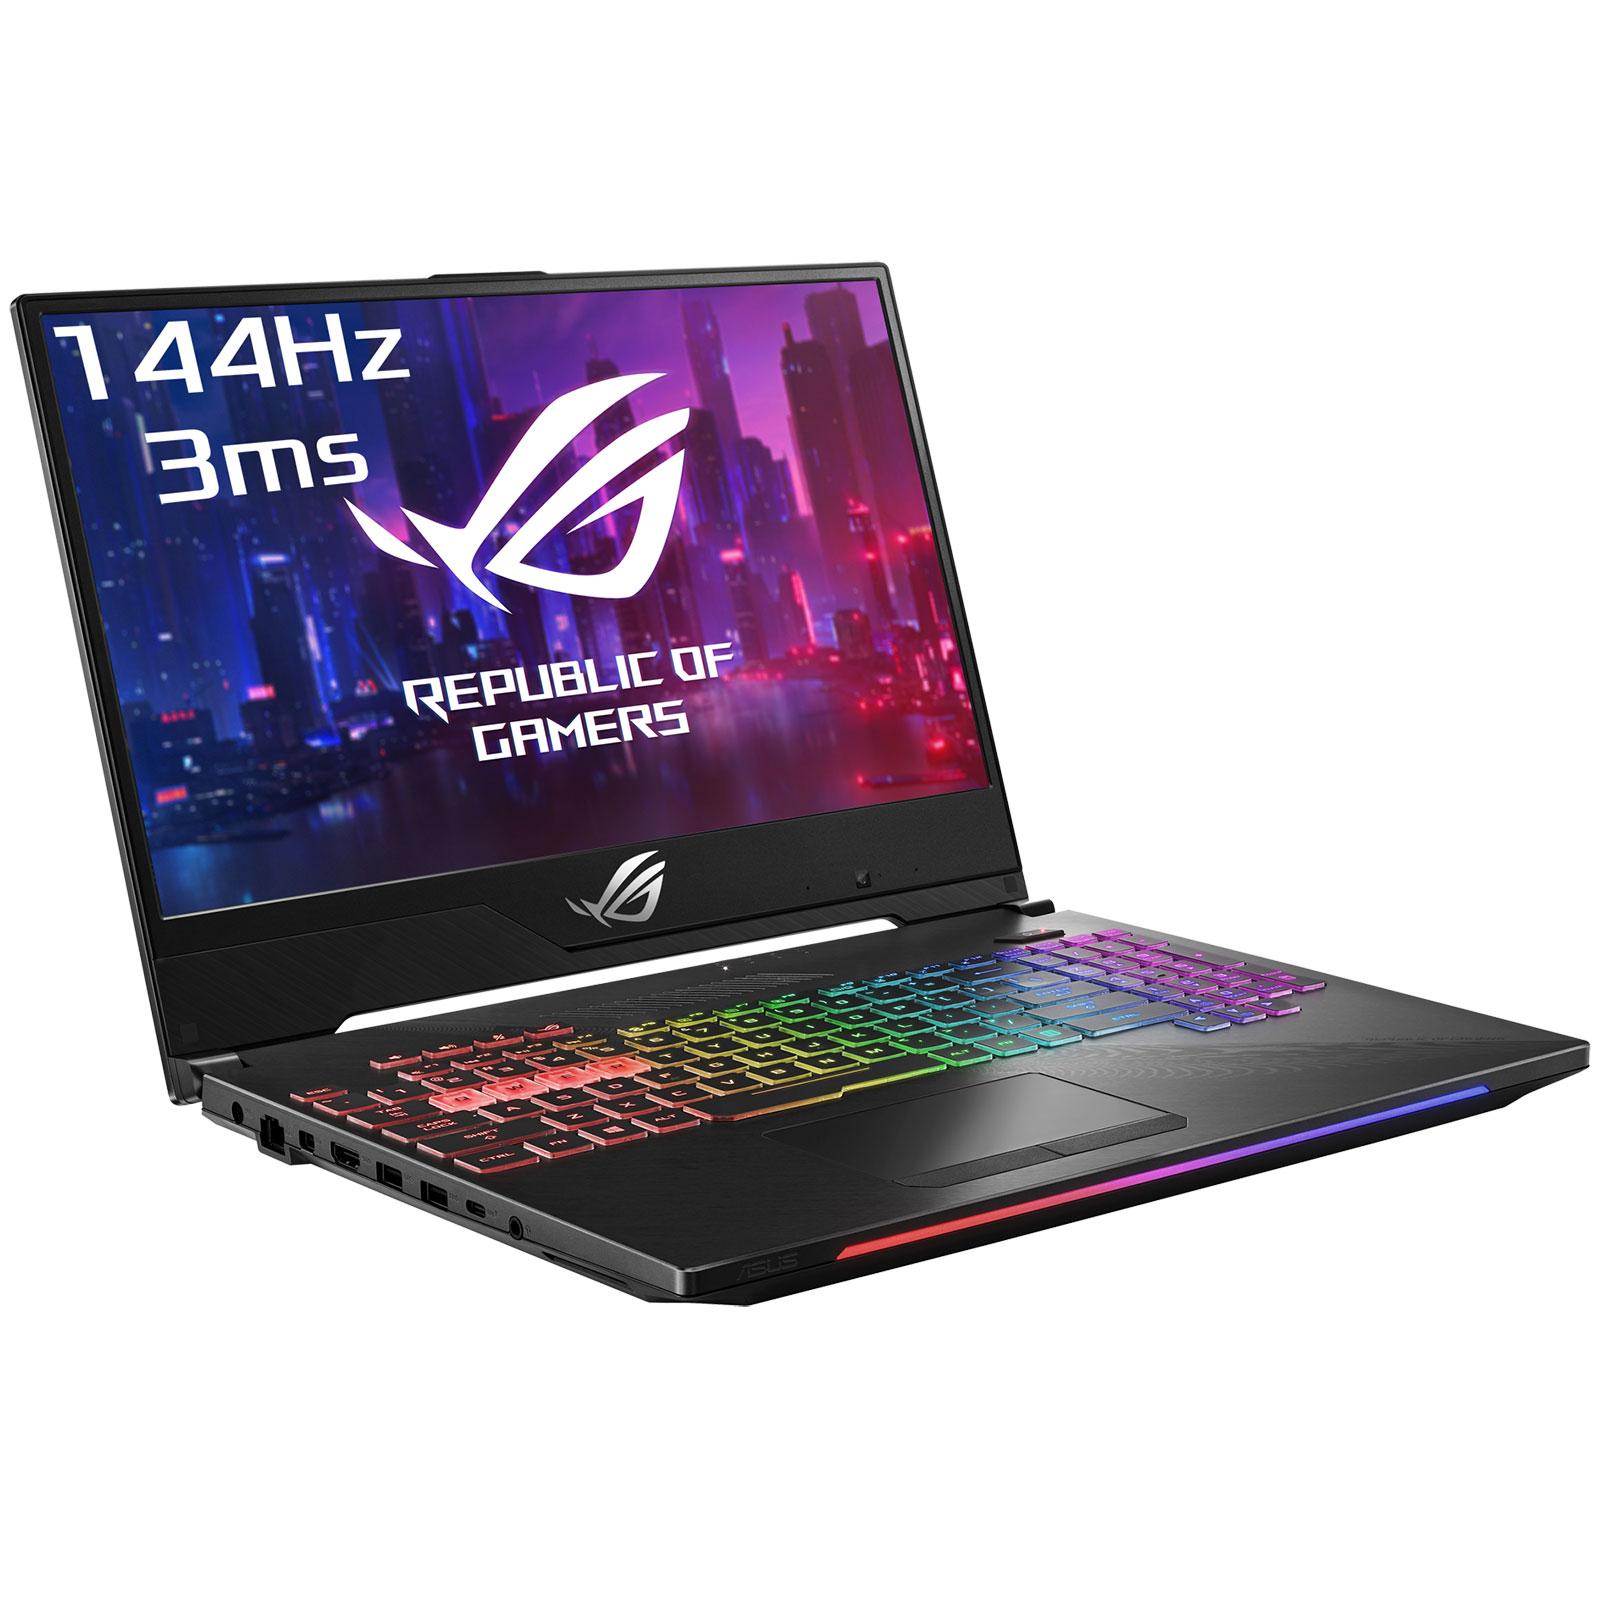 "PC portable ASUS ROG Strix Hero II G515GV-ES048T Intel Core i7-8750H 16 Go SSD 512 Go 15.6"" LED Full HD 144 Hz NVIDIA RTX 2060 6 Go Wi-Fi AC/Bluetooth Webcam Windows 10 Famille 64 bits (garantie constructeur 2 ans)"